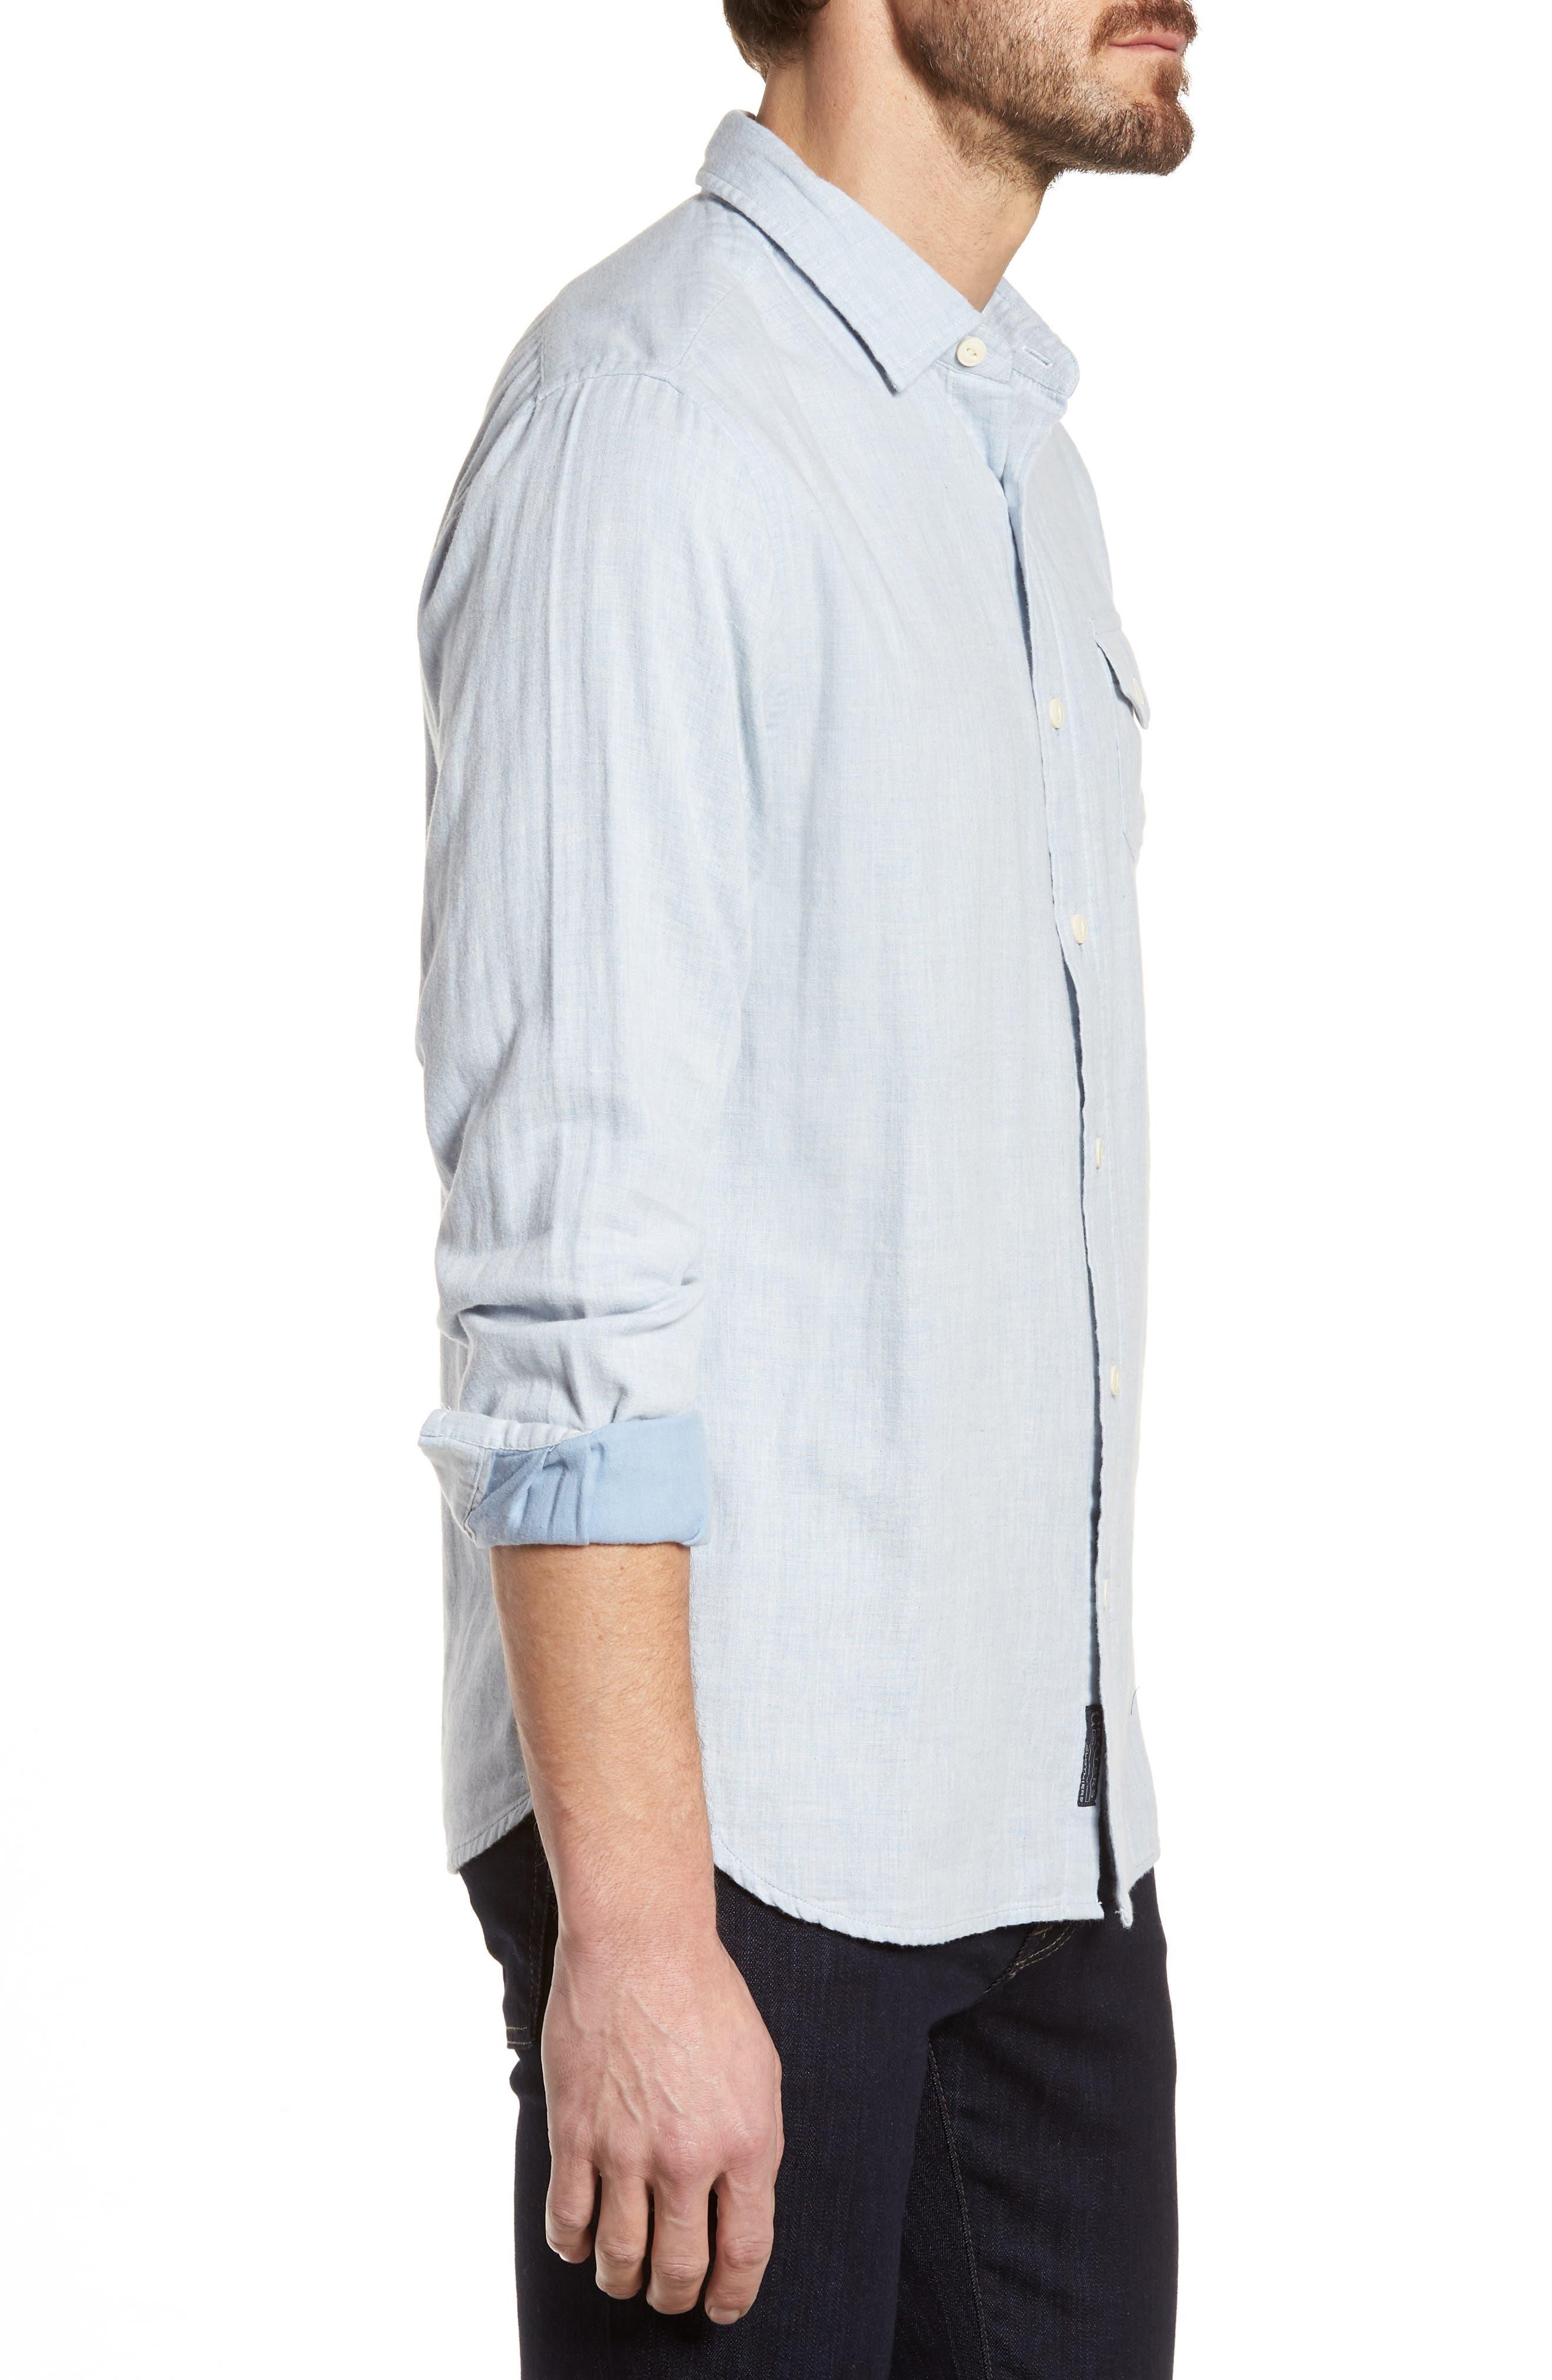 Hammond Slim Fit Sport Shirt,                             Alternate thumbnail 3, color,                             Light Blue Heather